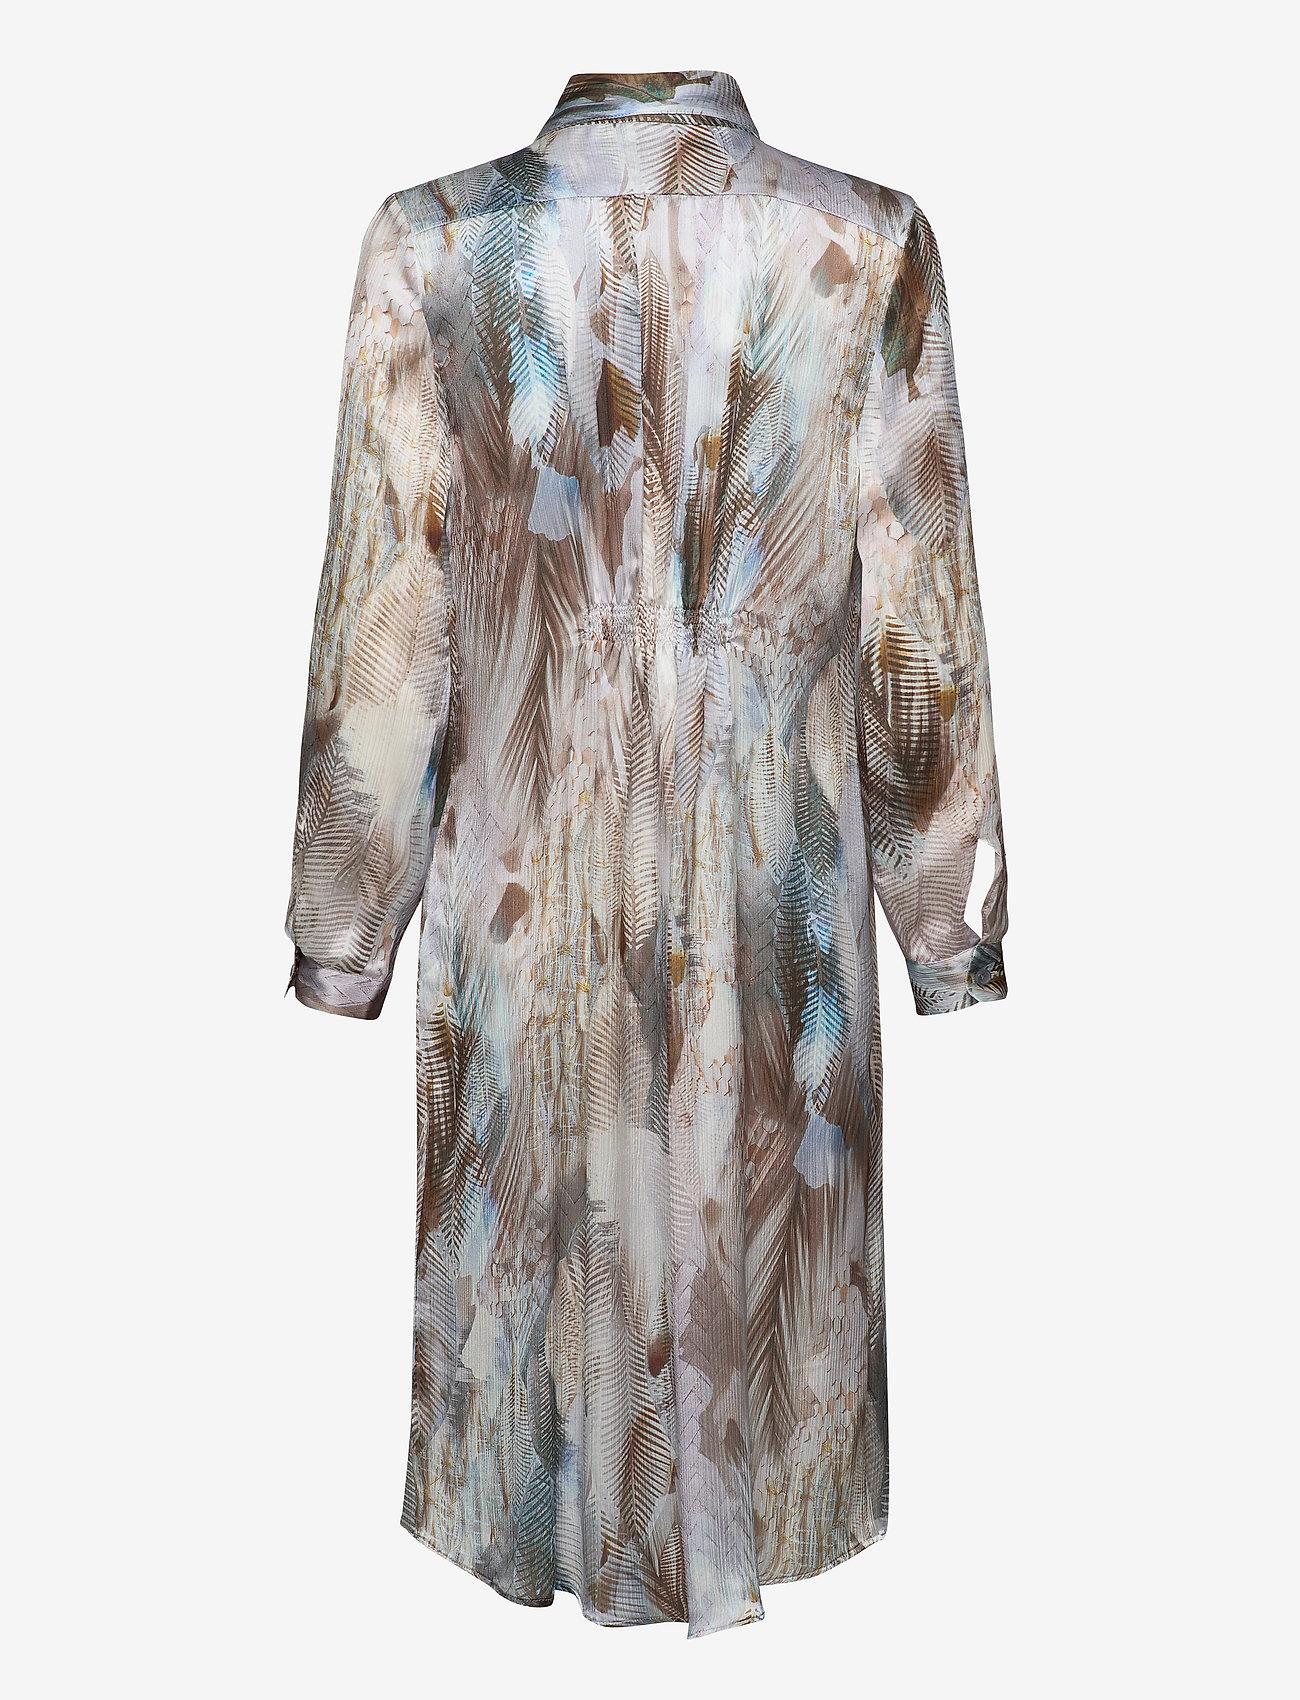 SAND - 3391 - Asia Dress - paitamekot - pattern - 1